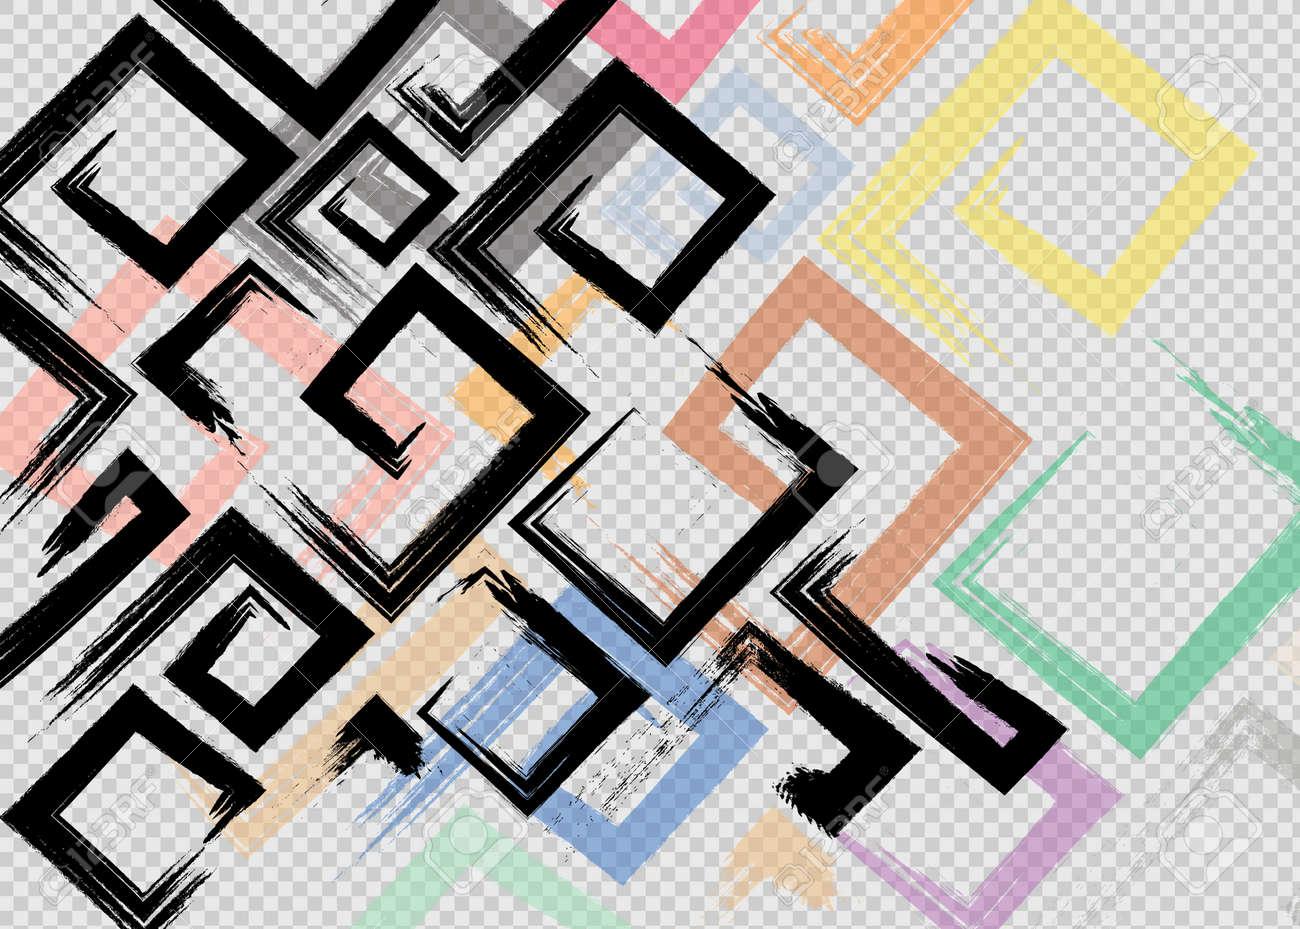 Cute vector geometric seamless pattern. Brush strokes, arrows. Hand drawn grunge texture - 169712011